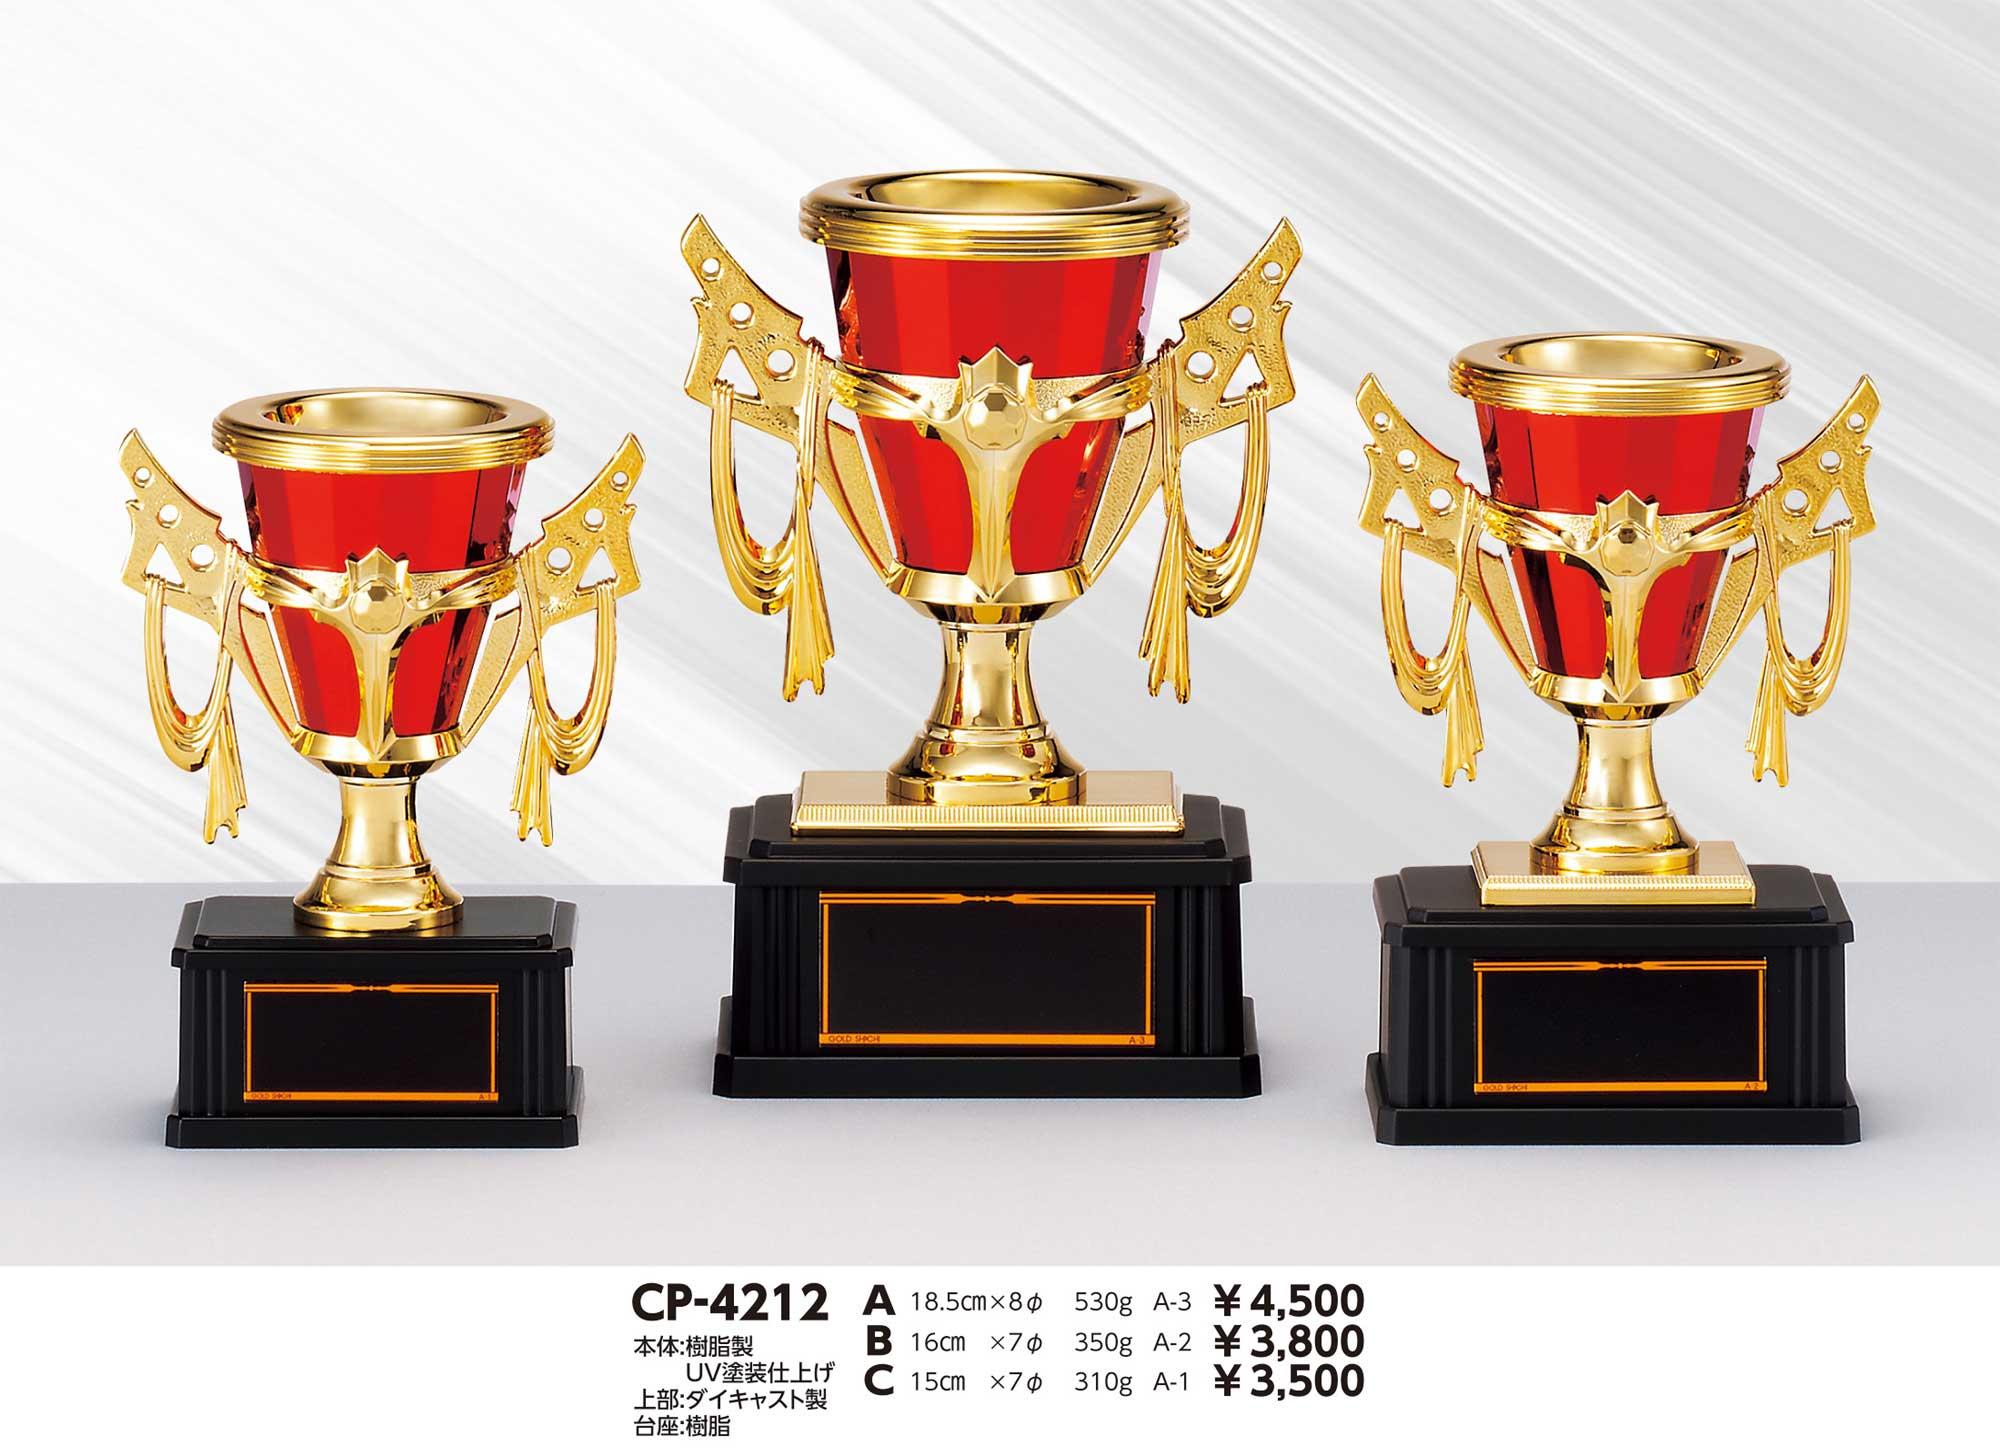 CP4212